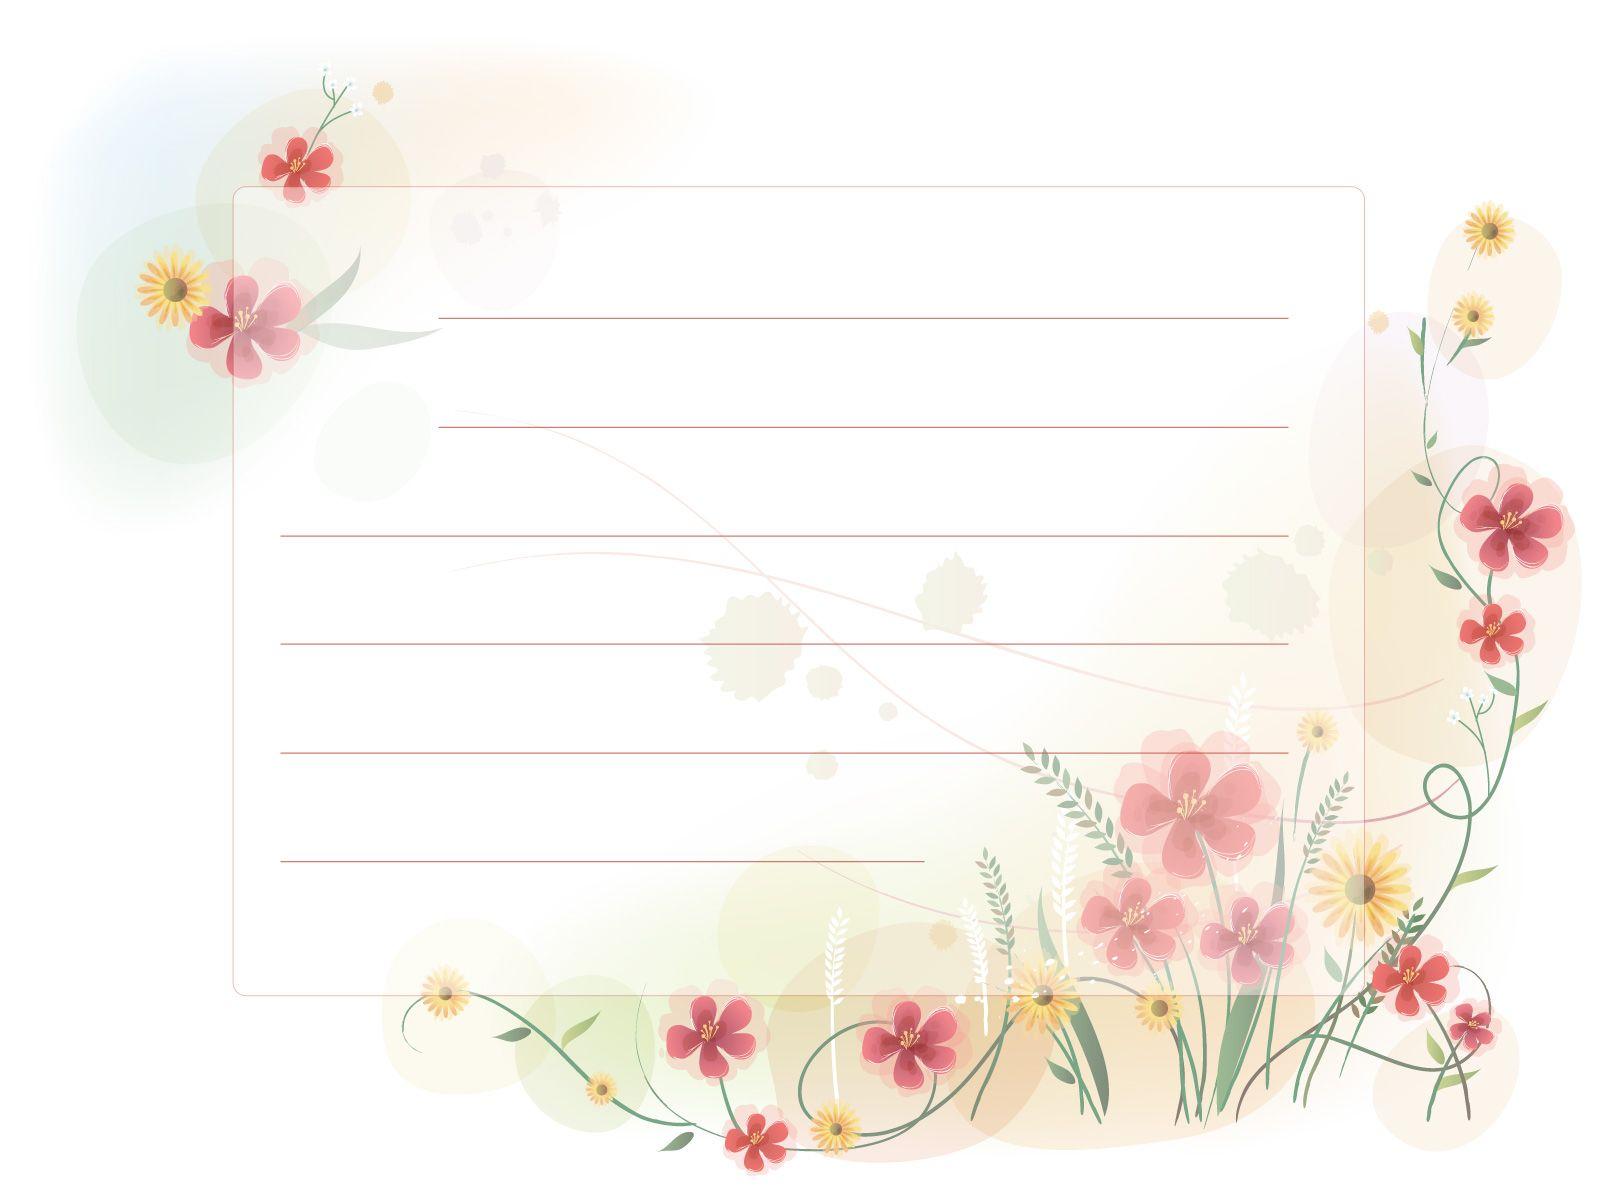 Plantillas para cartas | Plantillas para cartas | Pinterest ...